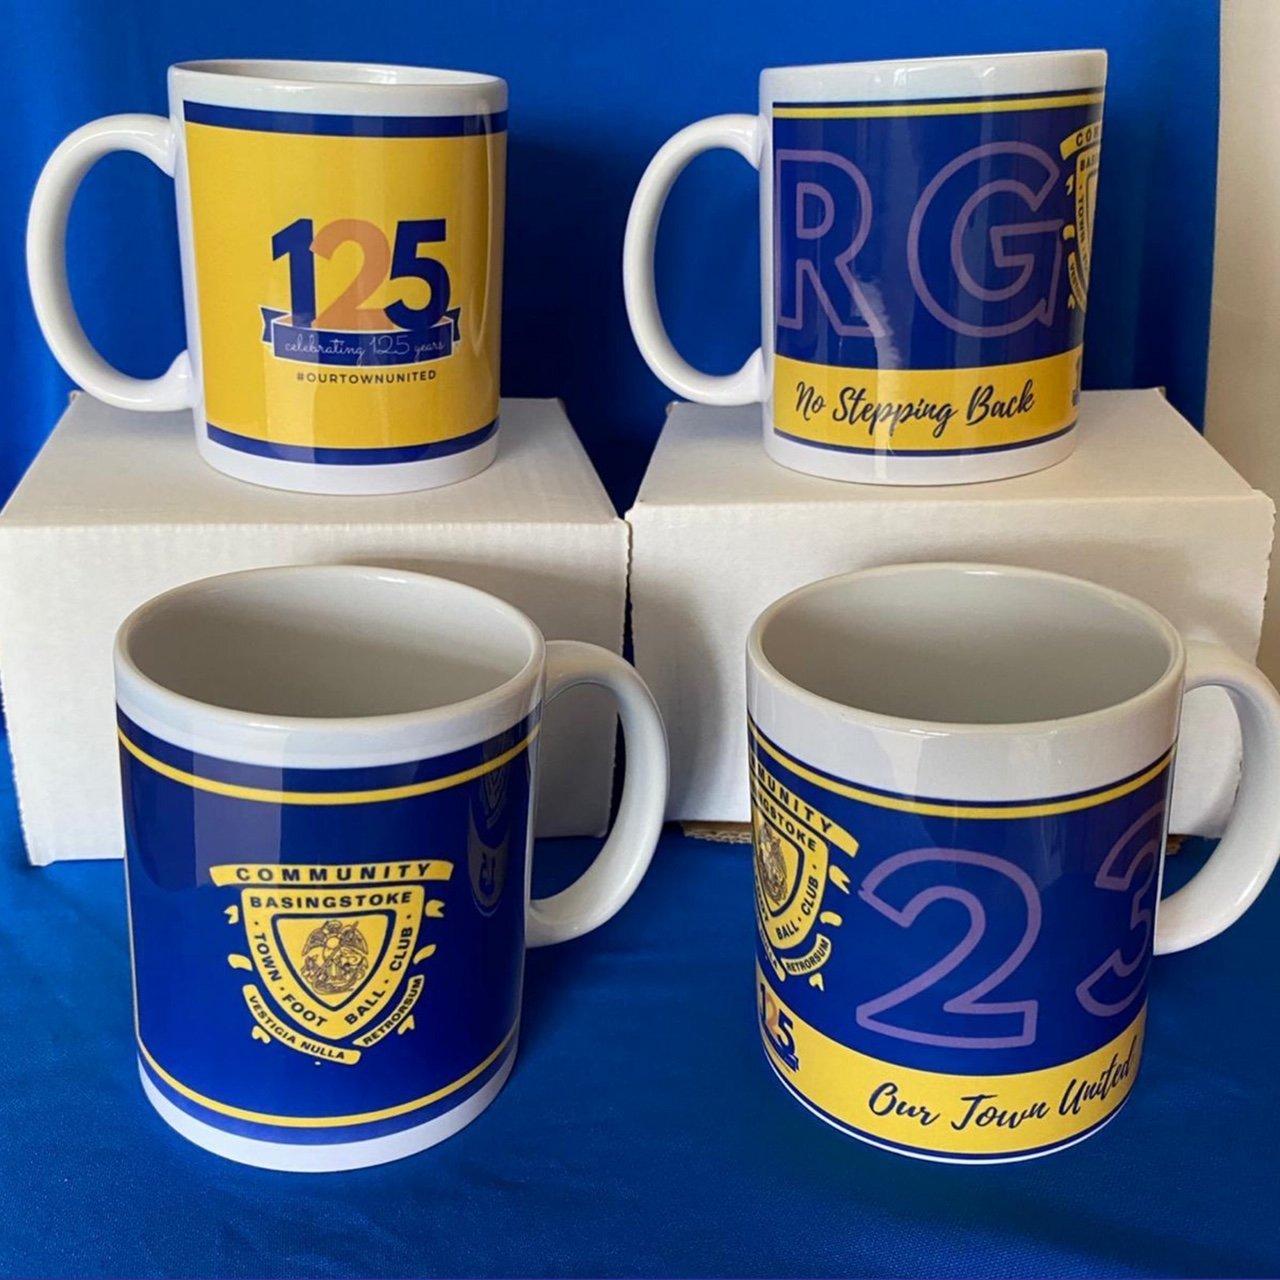 Image of Basingstoke Town FC Mugs